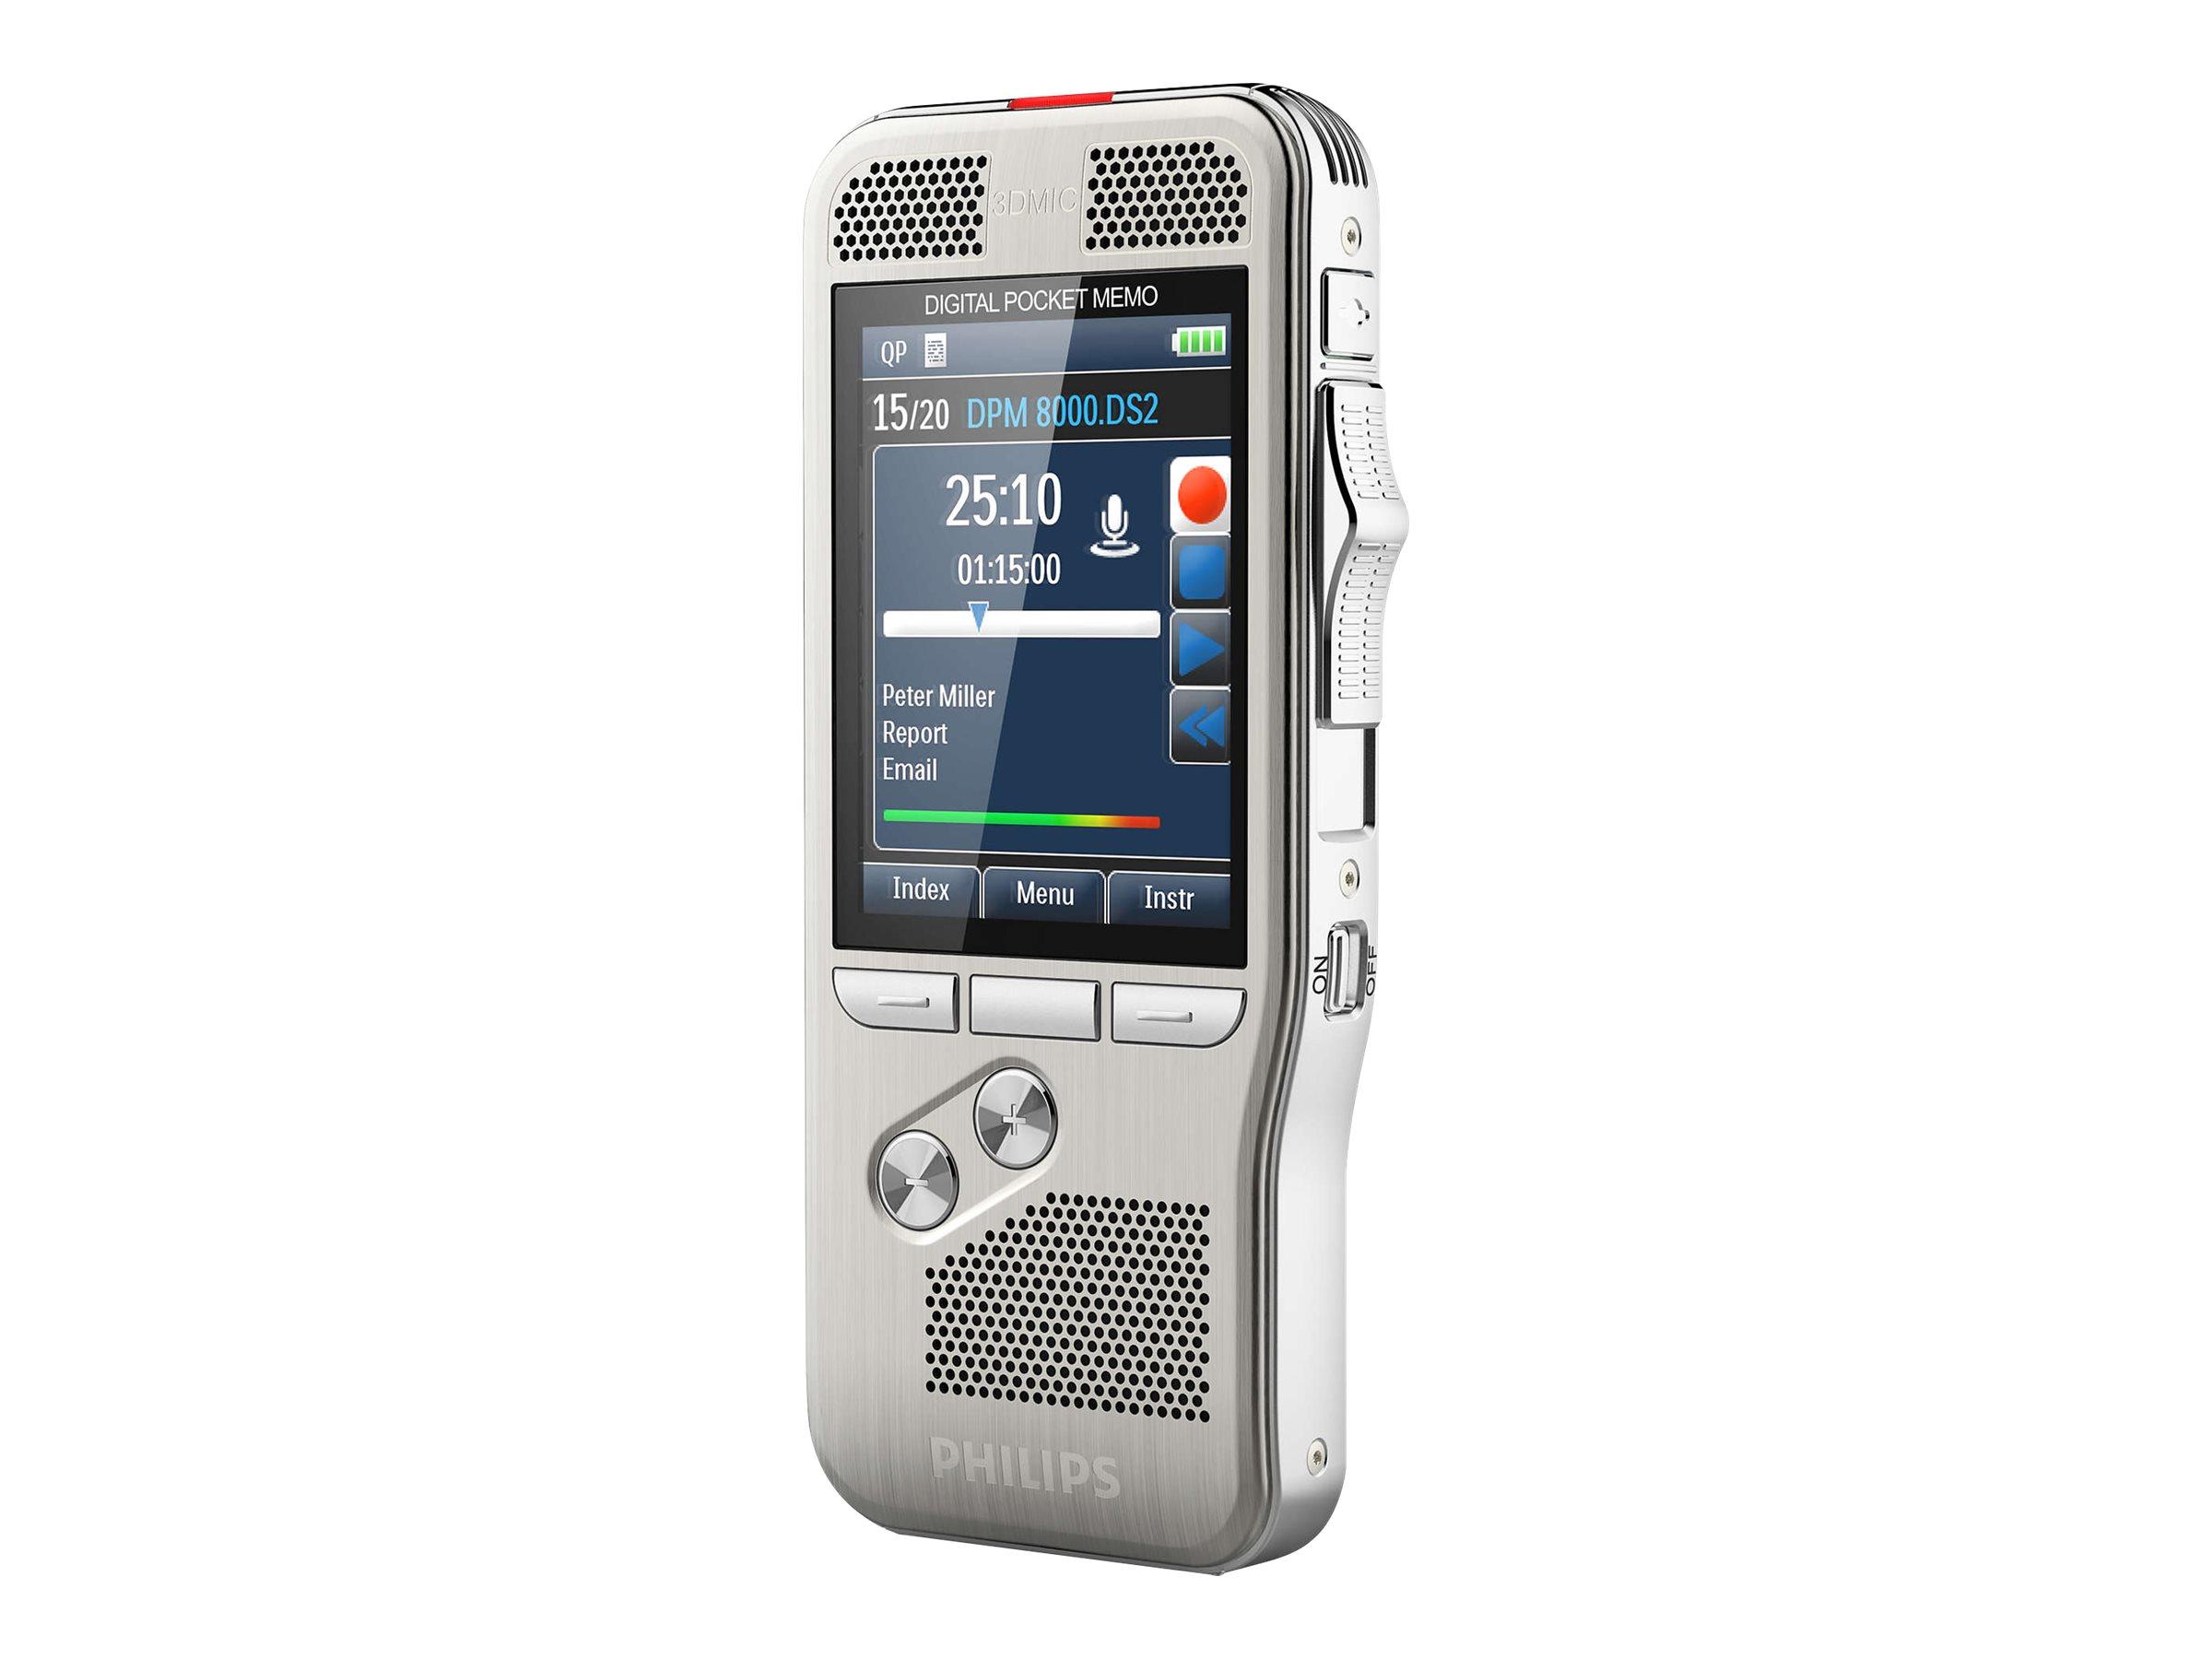 Philips Pocket Memo DPM8100 - Voicerecorder - 200 mW - 4 GB